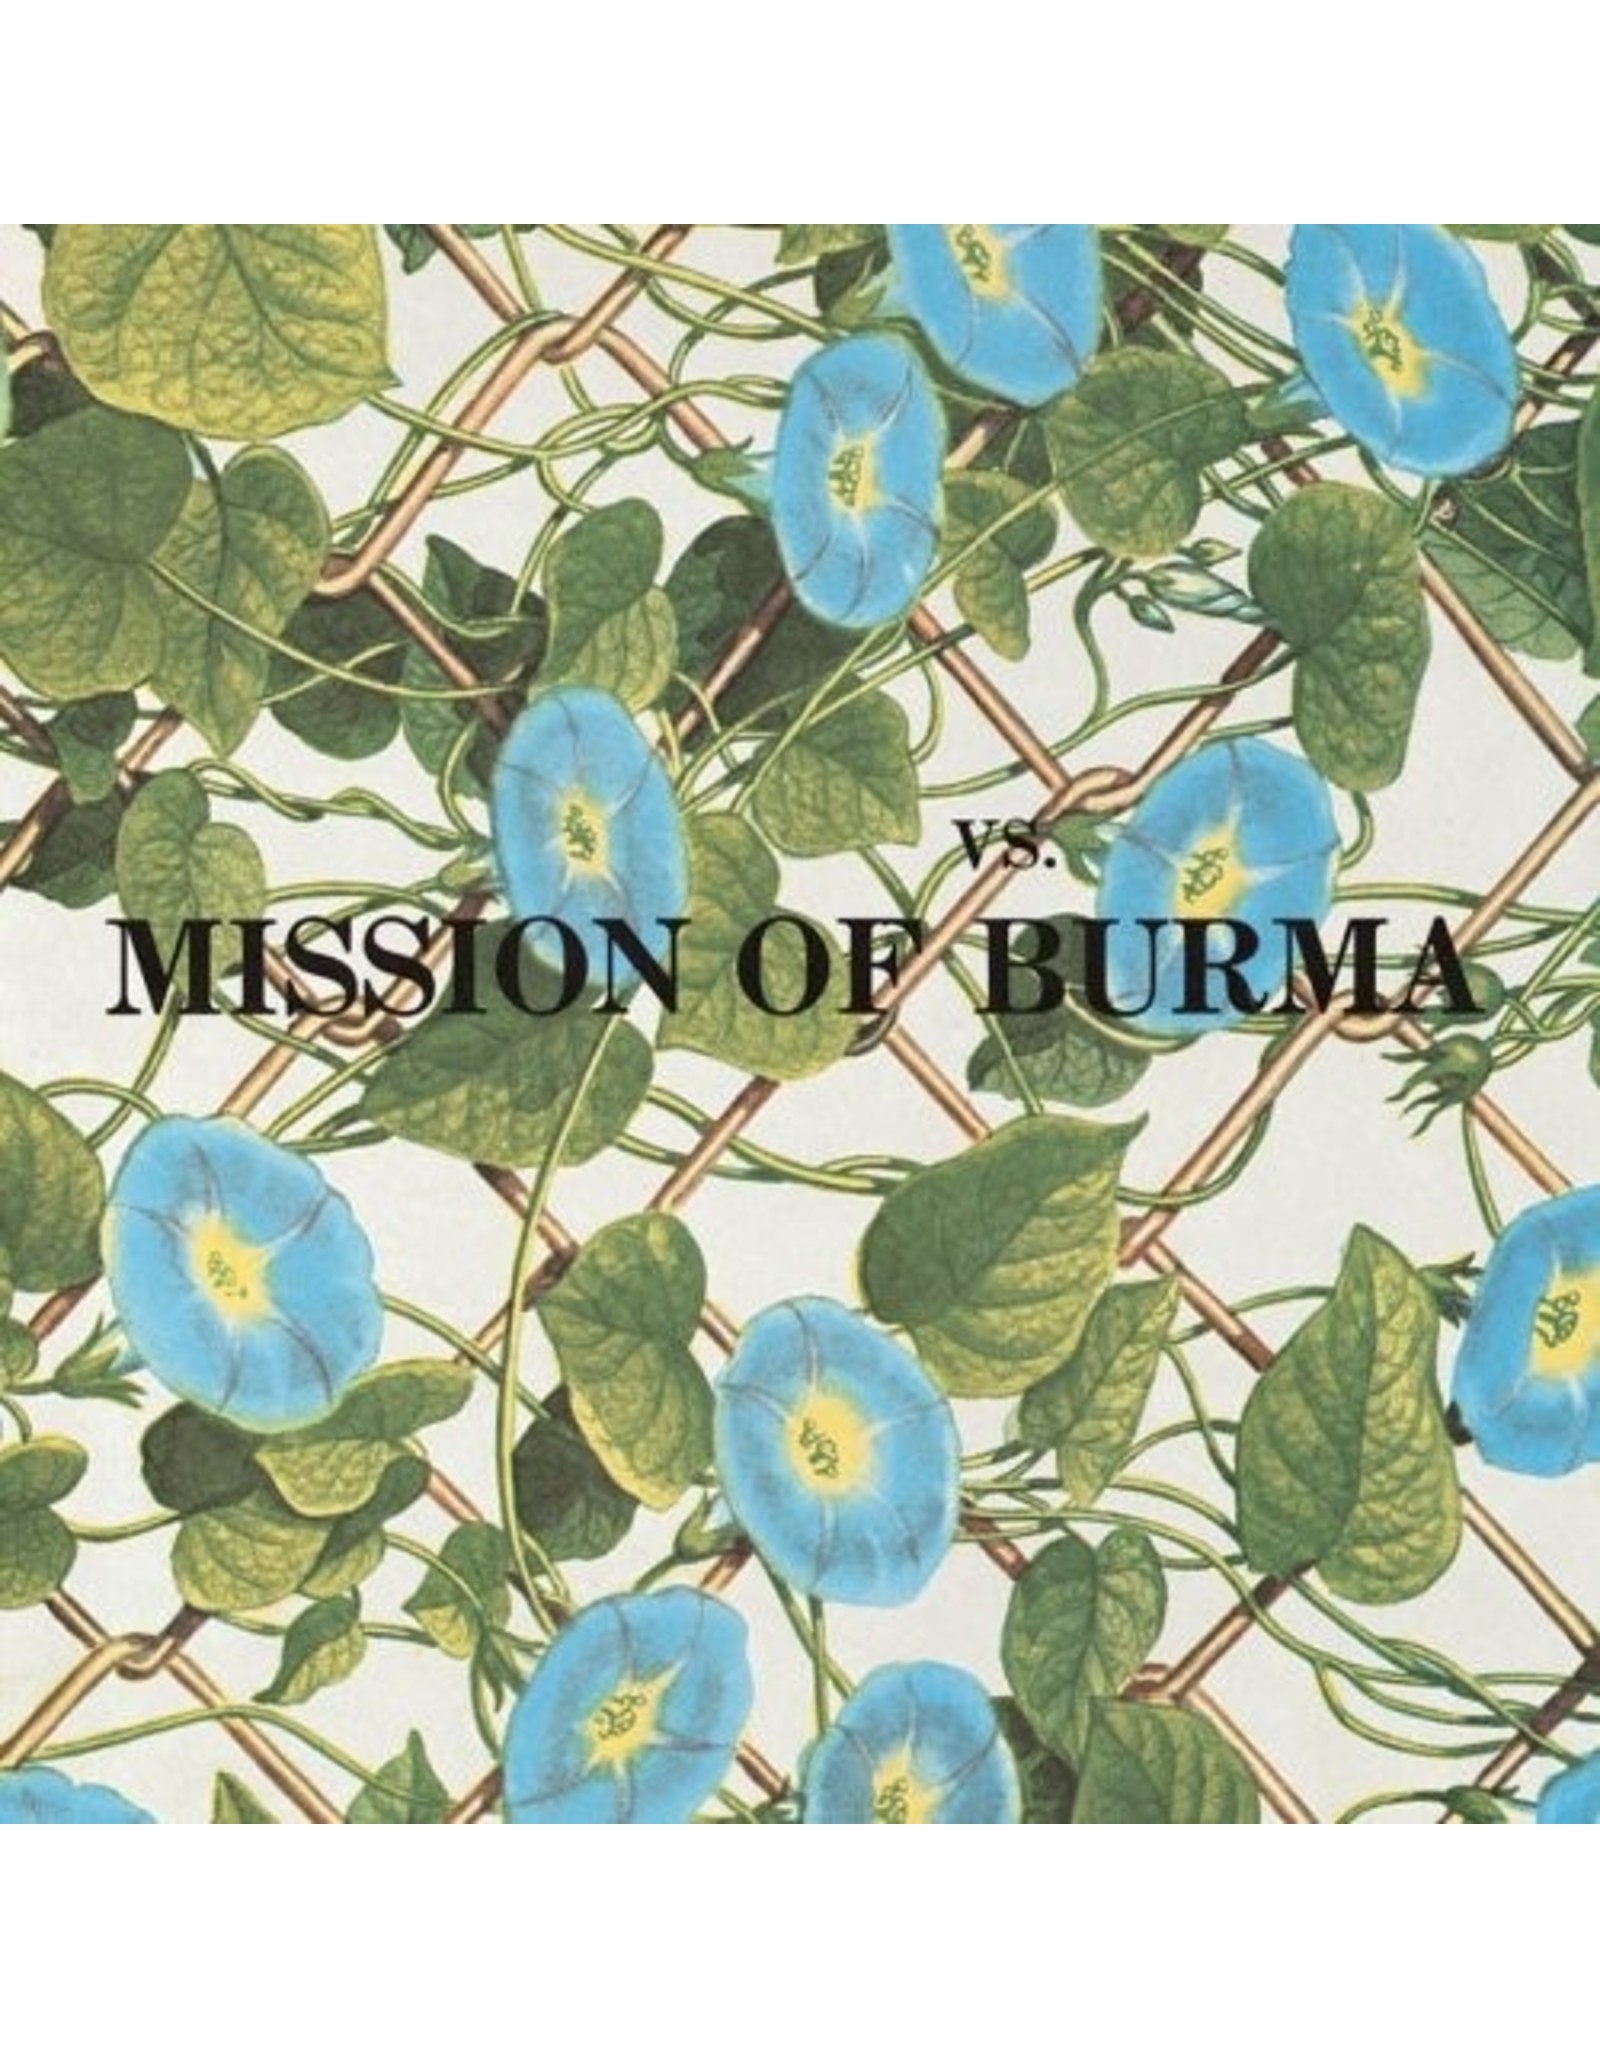 New Vinyl Mission of Burma - Vs. LP